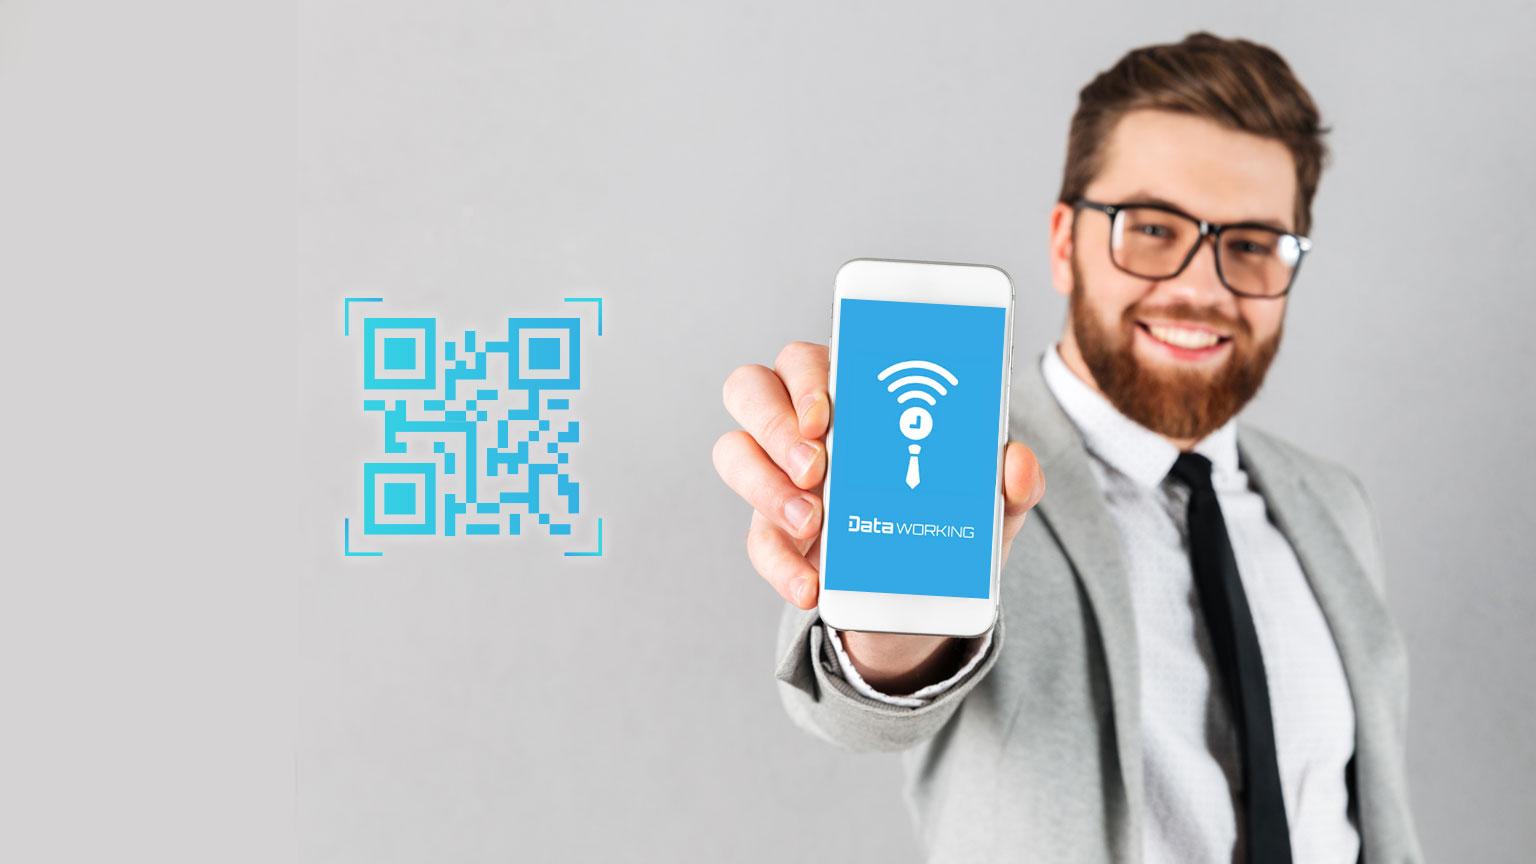 Data Working app Telnet Data gestione timbrature da remoto